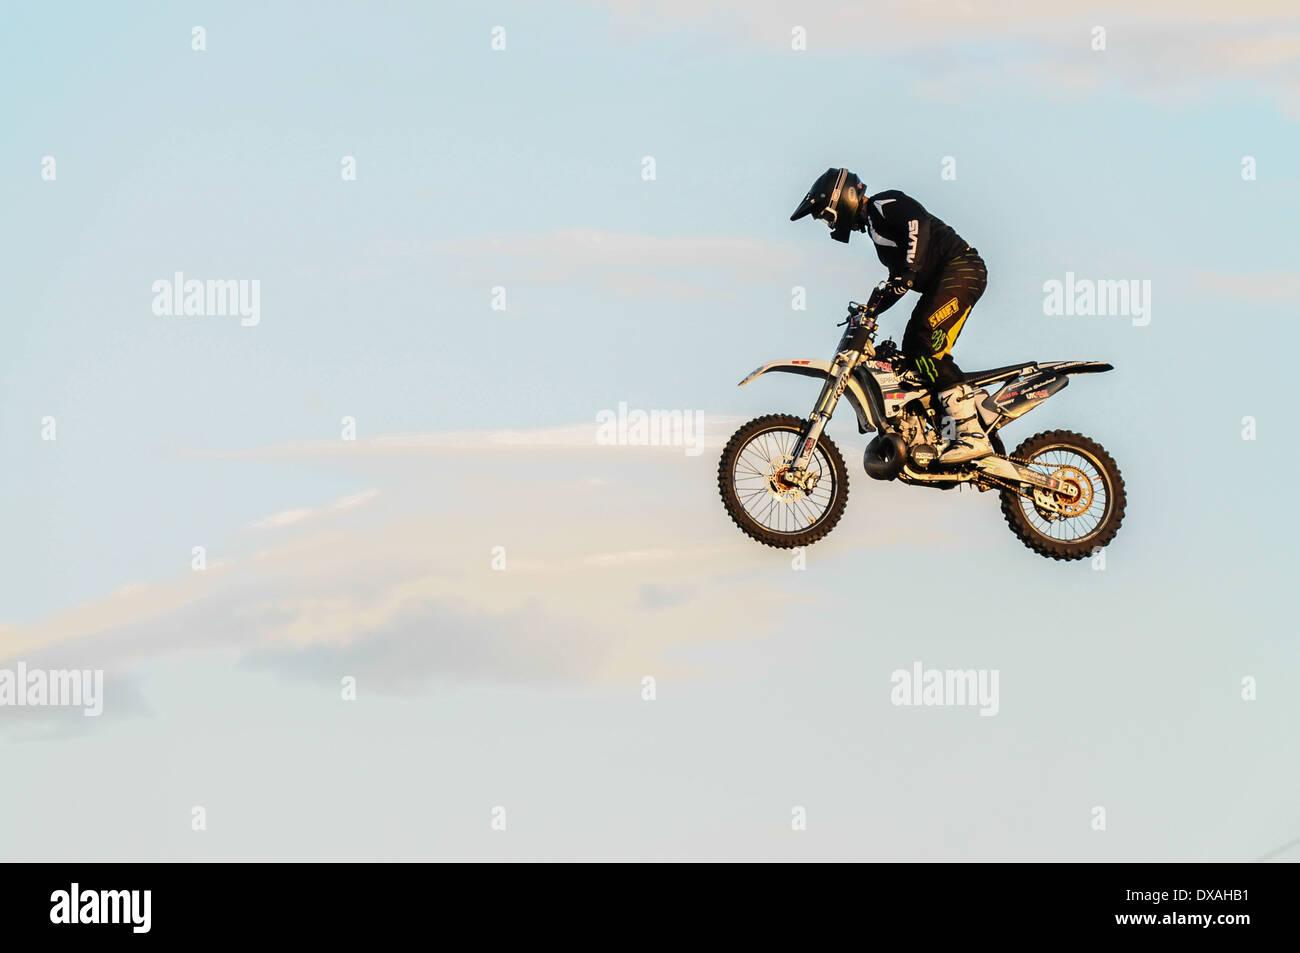 dirt bike backgrounds.html